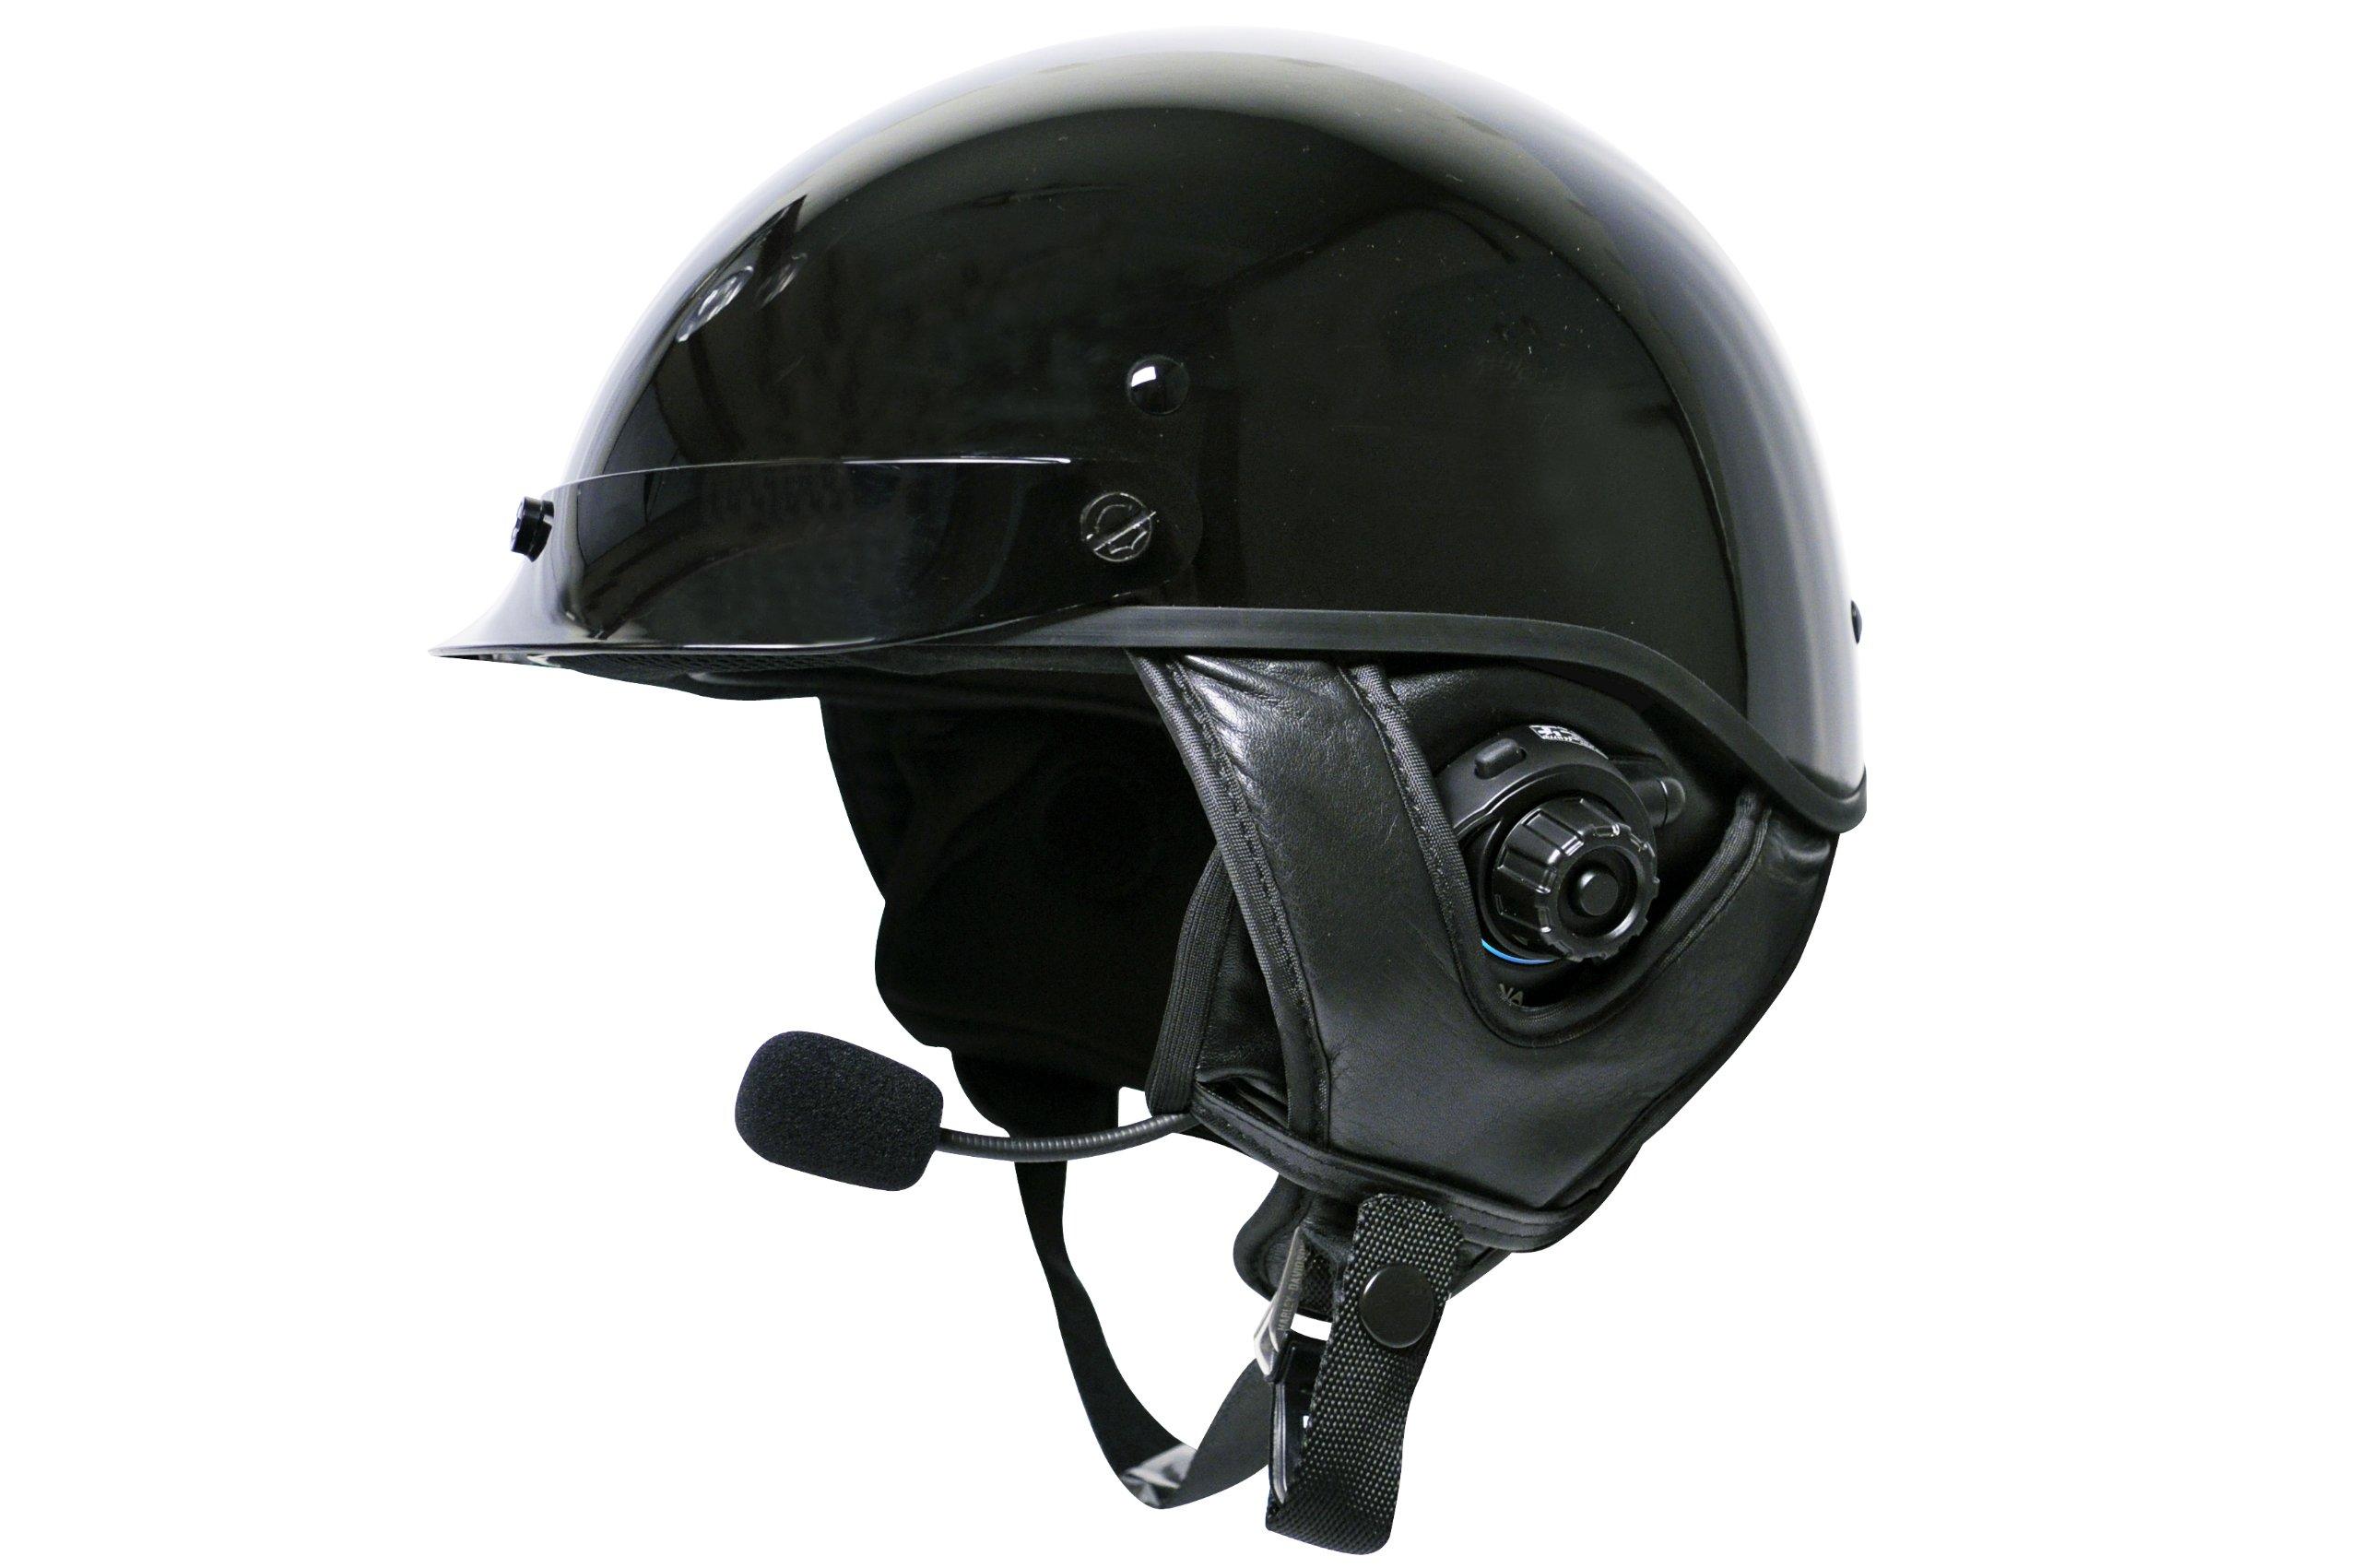 Sena SPH10H-01 Outdoor Sports Bluetooth Stereo Headset / Intercom for Half-Helmets